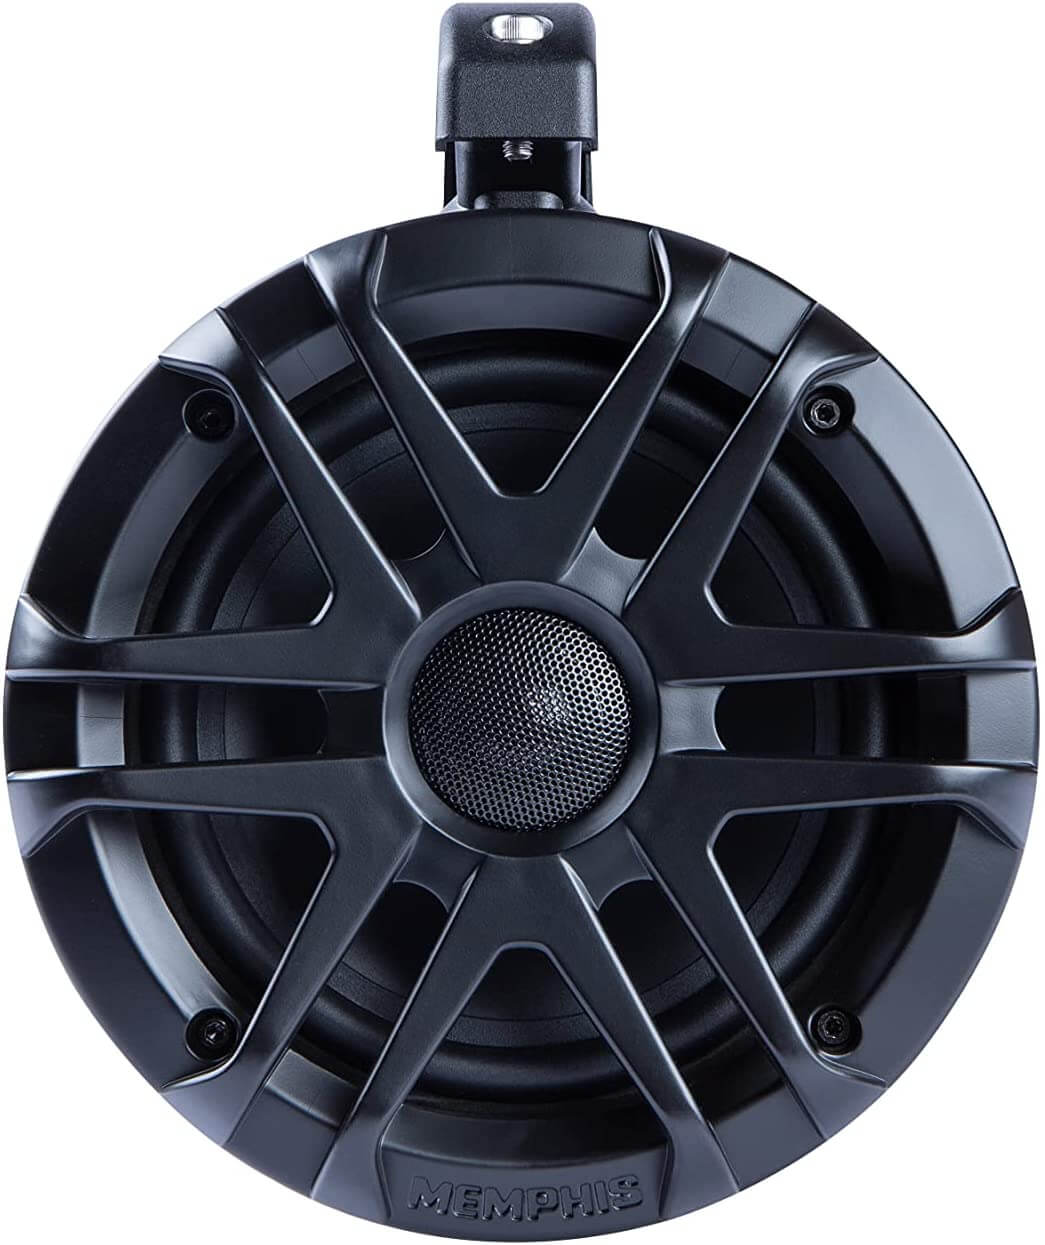 Pair Memphis Audio MXA62PS LED Tower Speakers